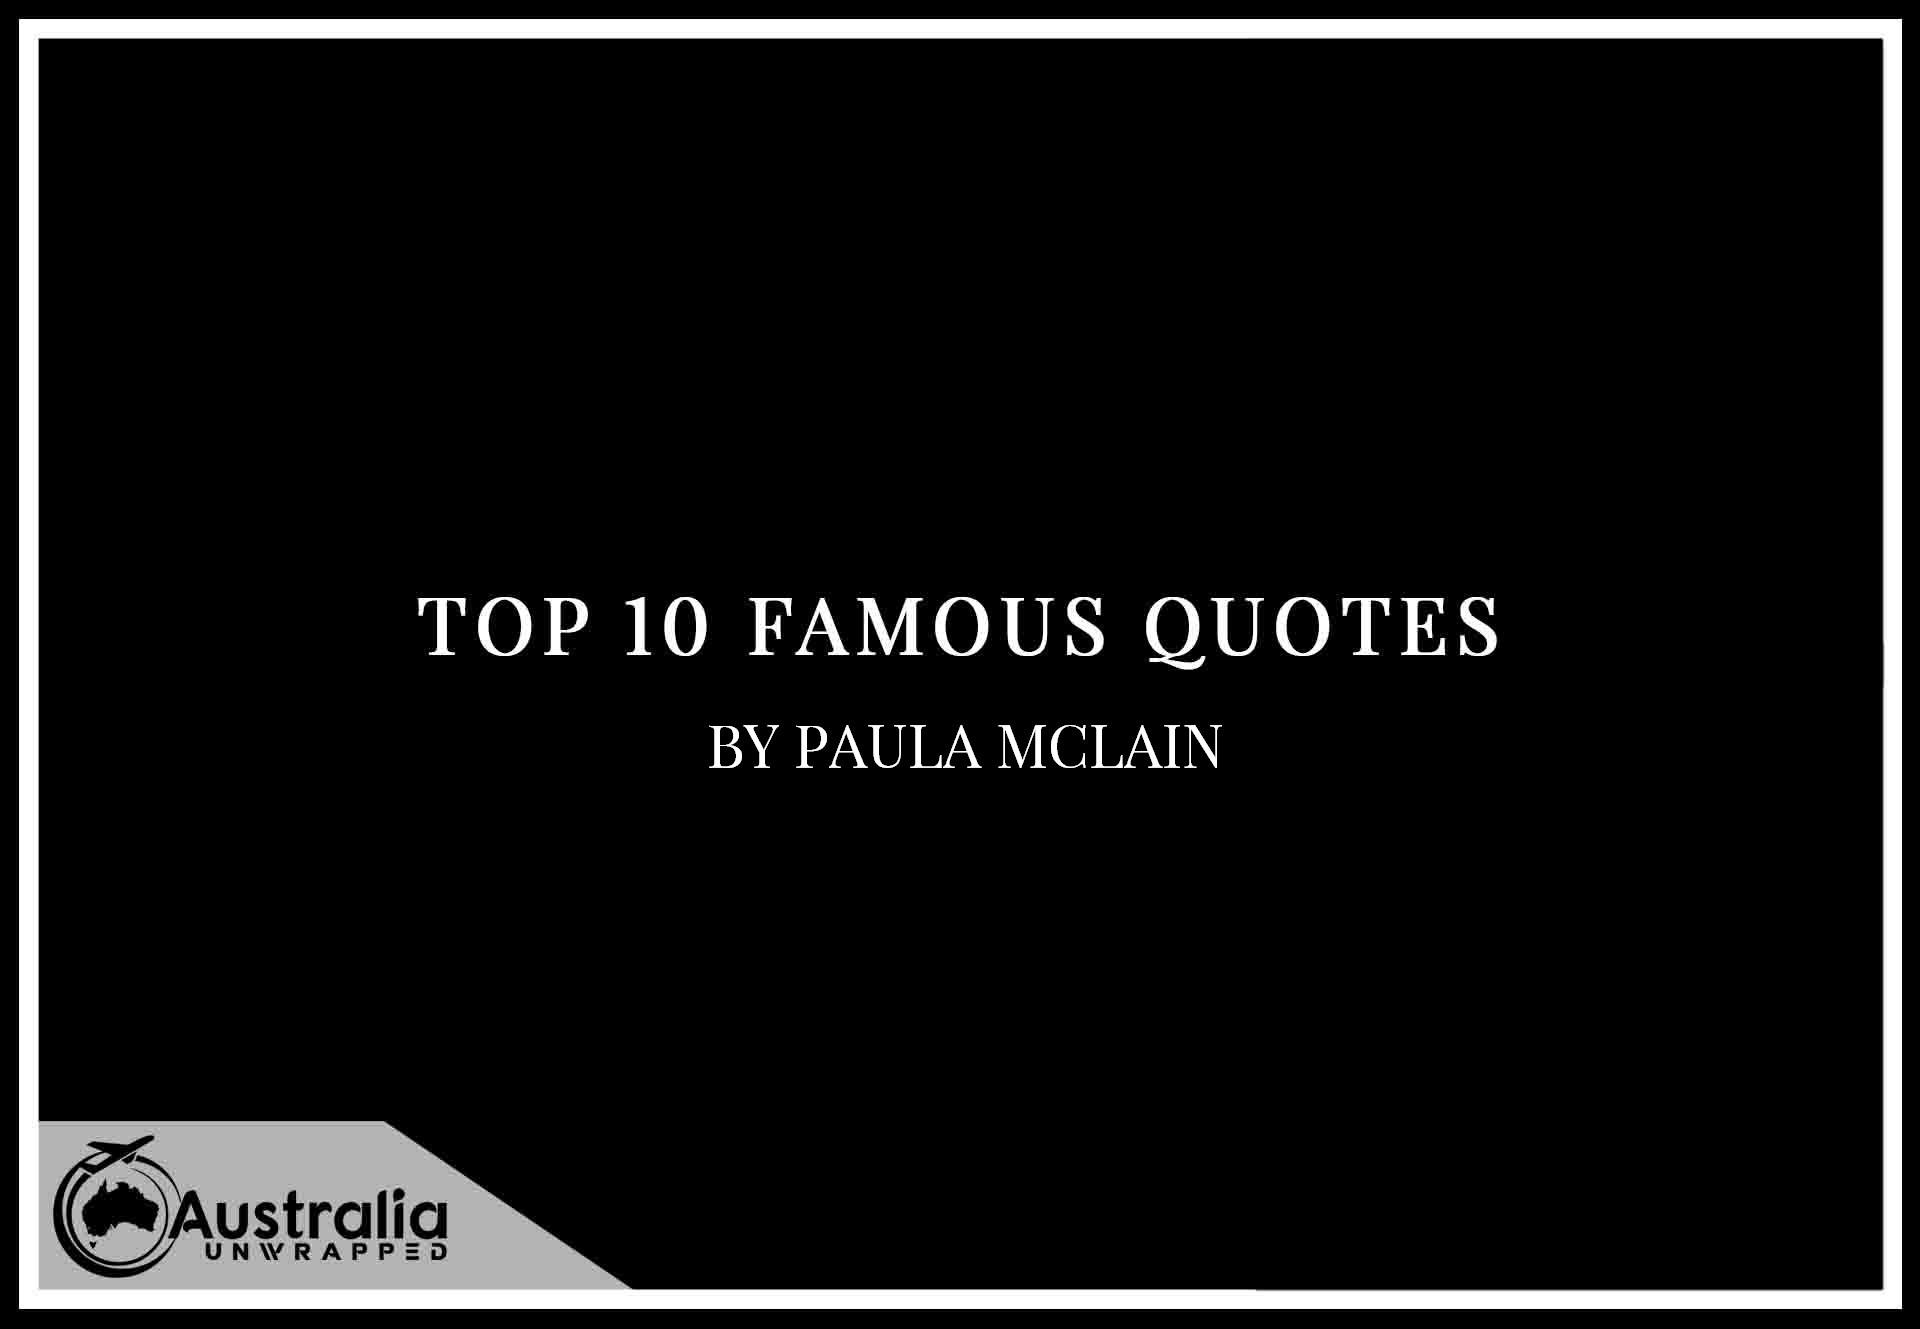 Top 10 Famous Quotes by Author Paula McLain